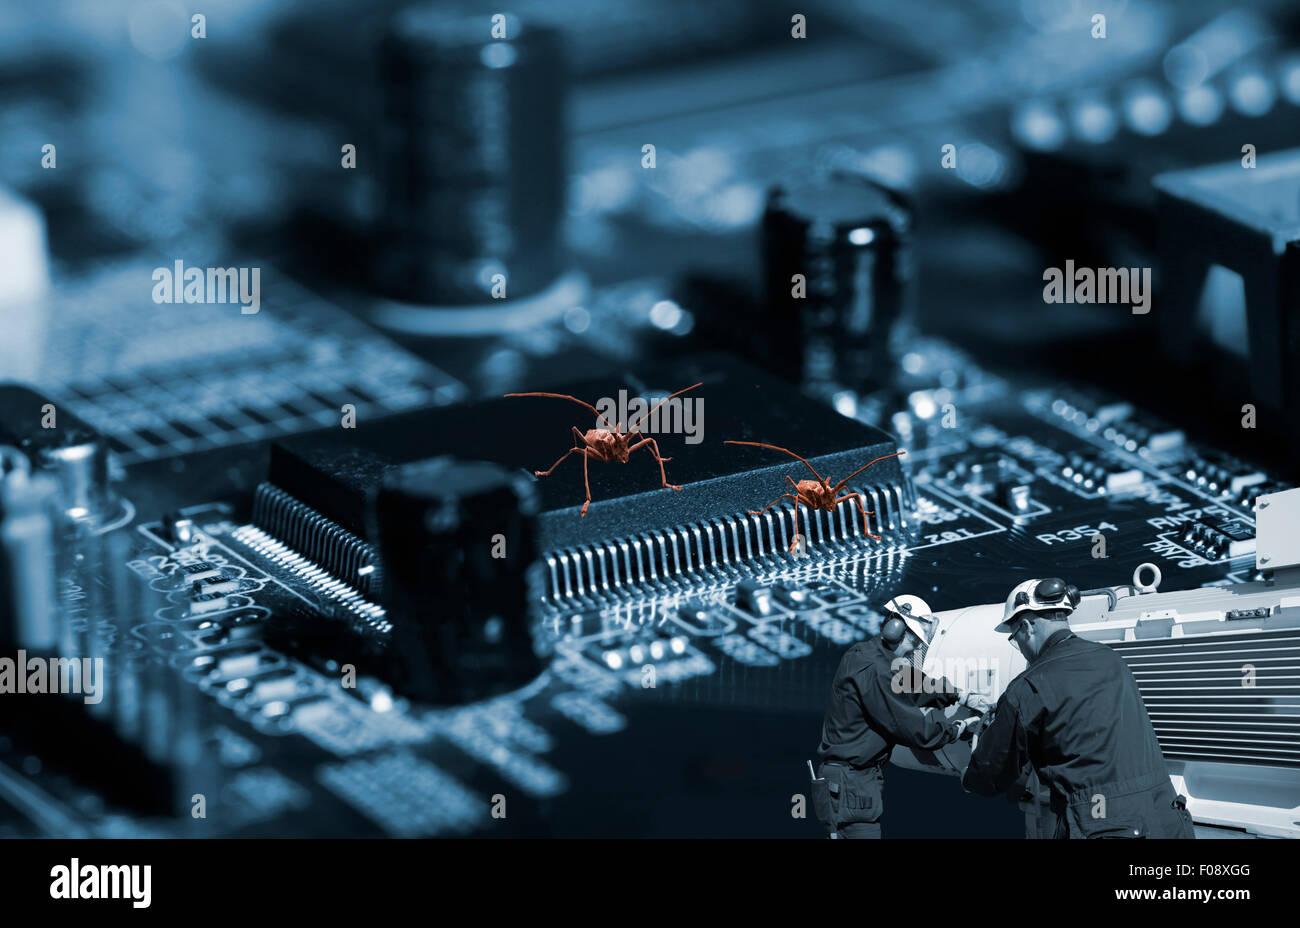 technicians fighting computer bugs, viruses - Stock Image